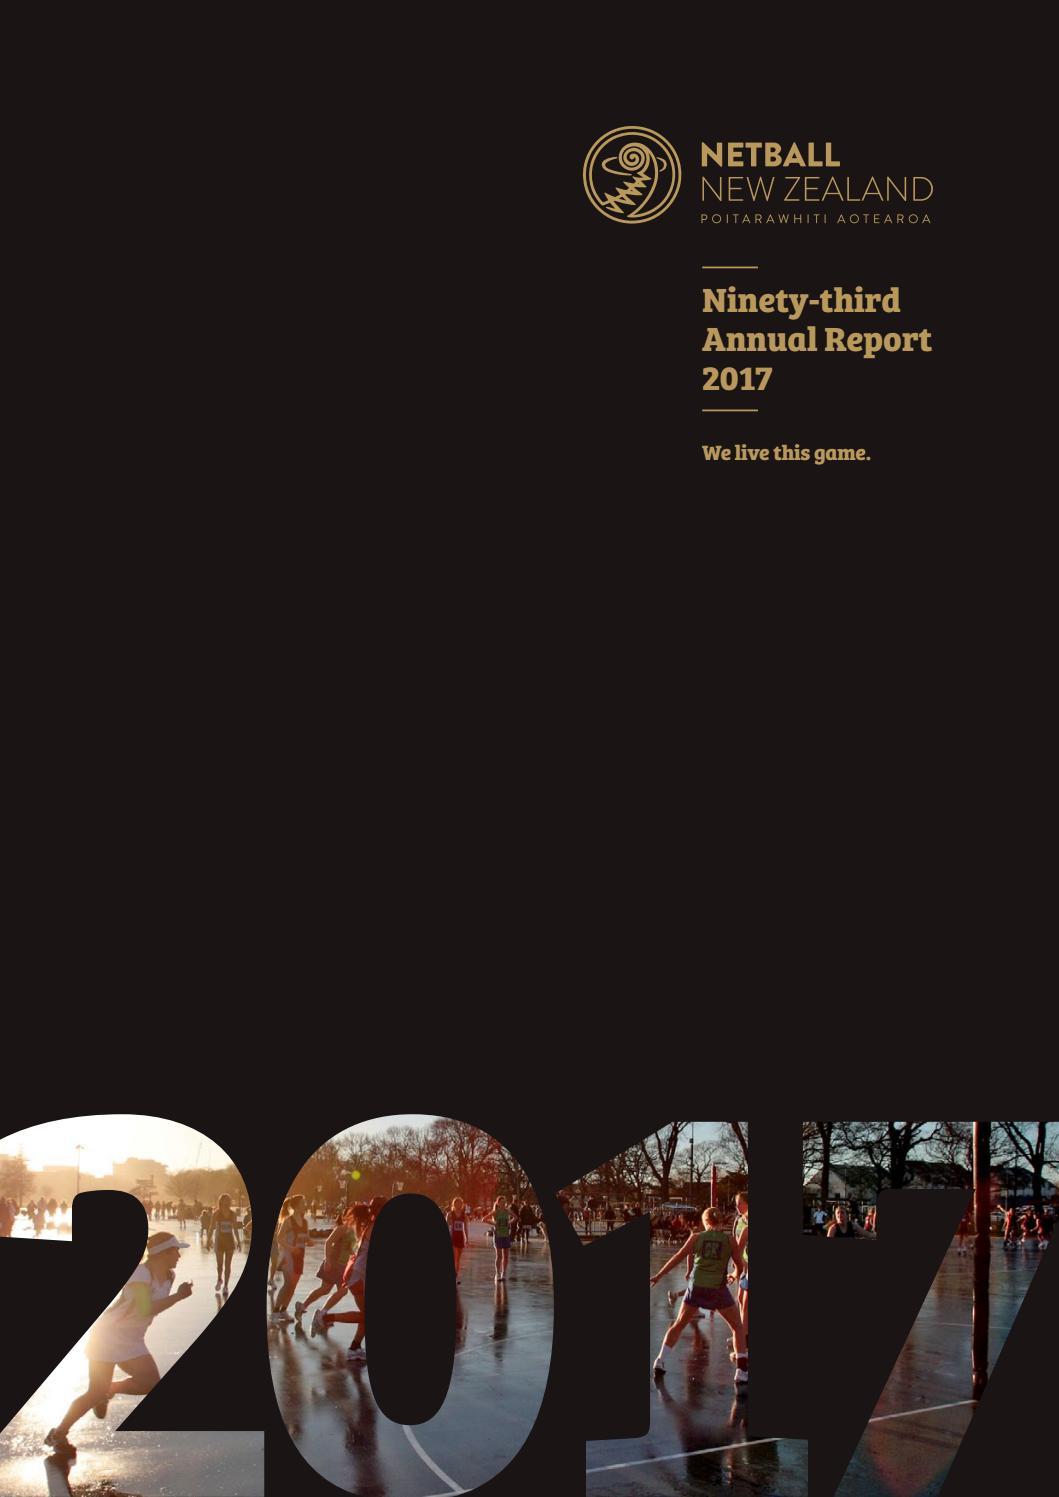 Netball New Zealand Annual Report - 2017 by Netball NZ - issuu